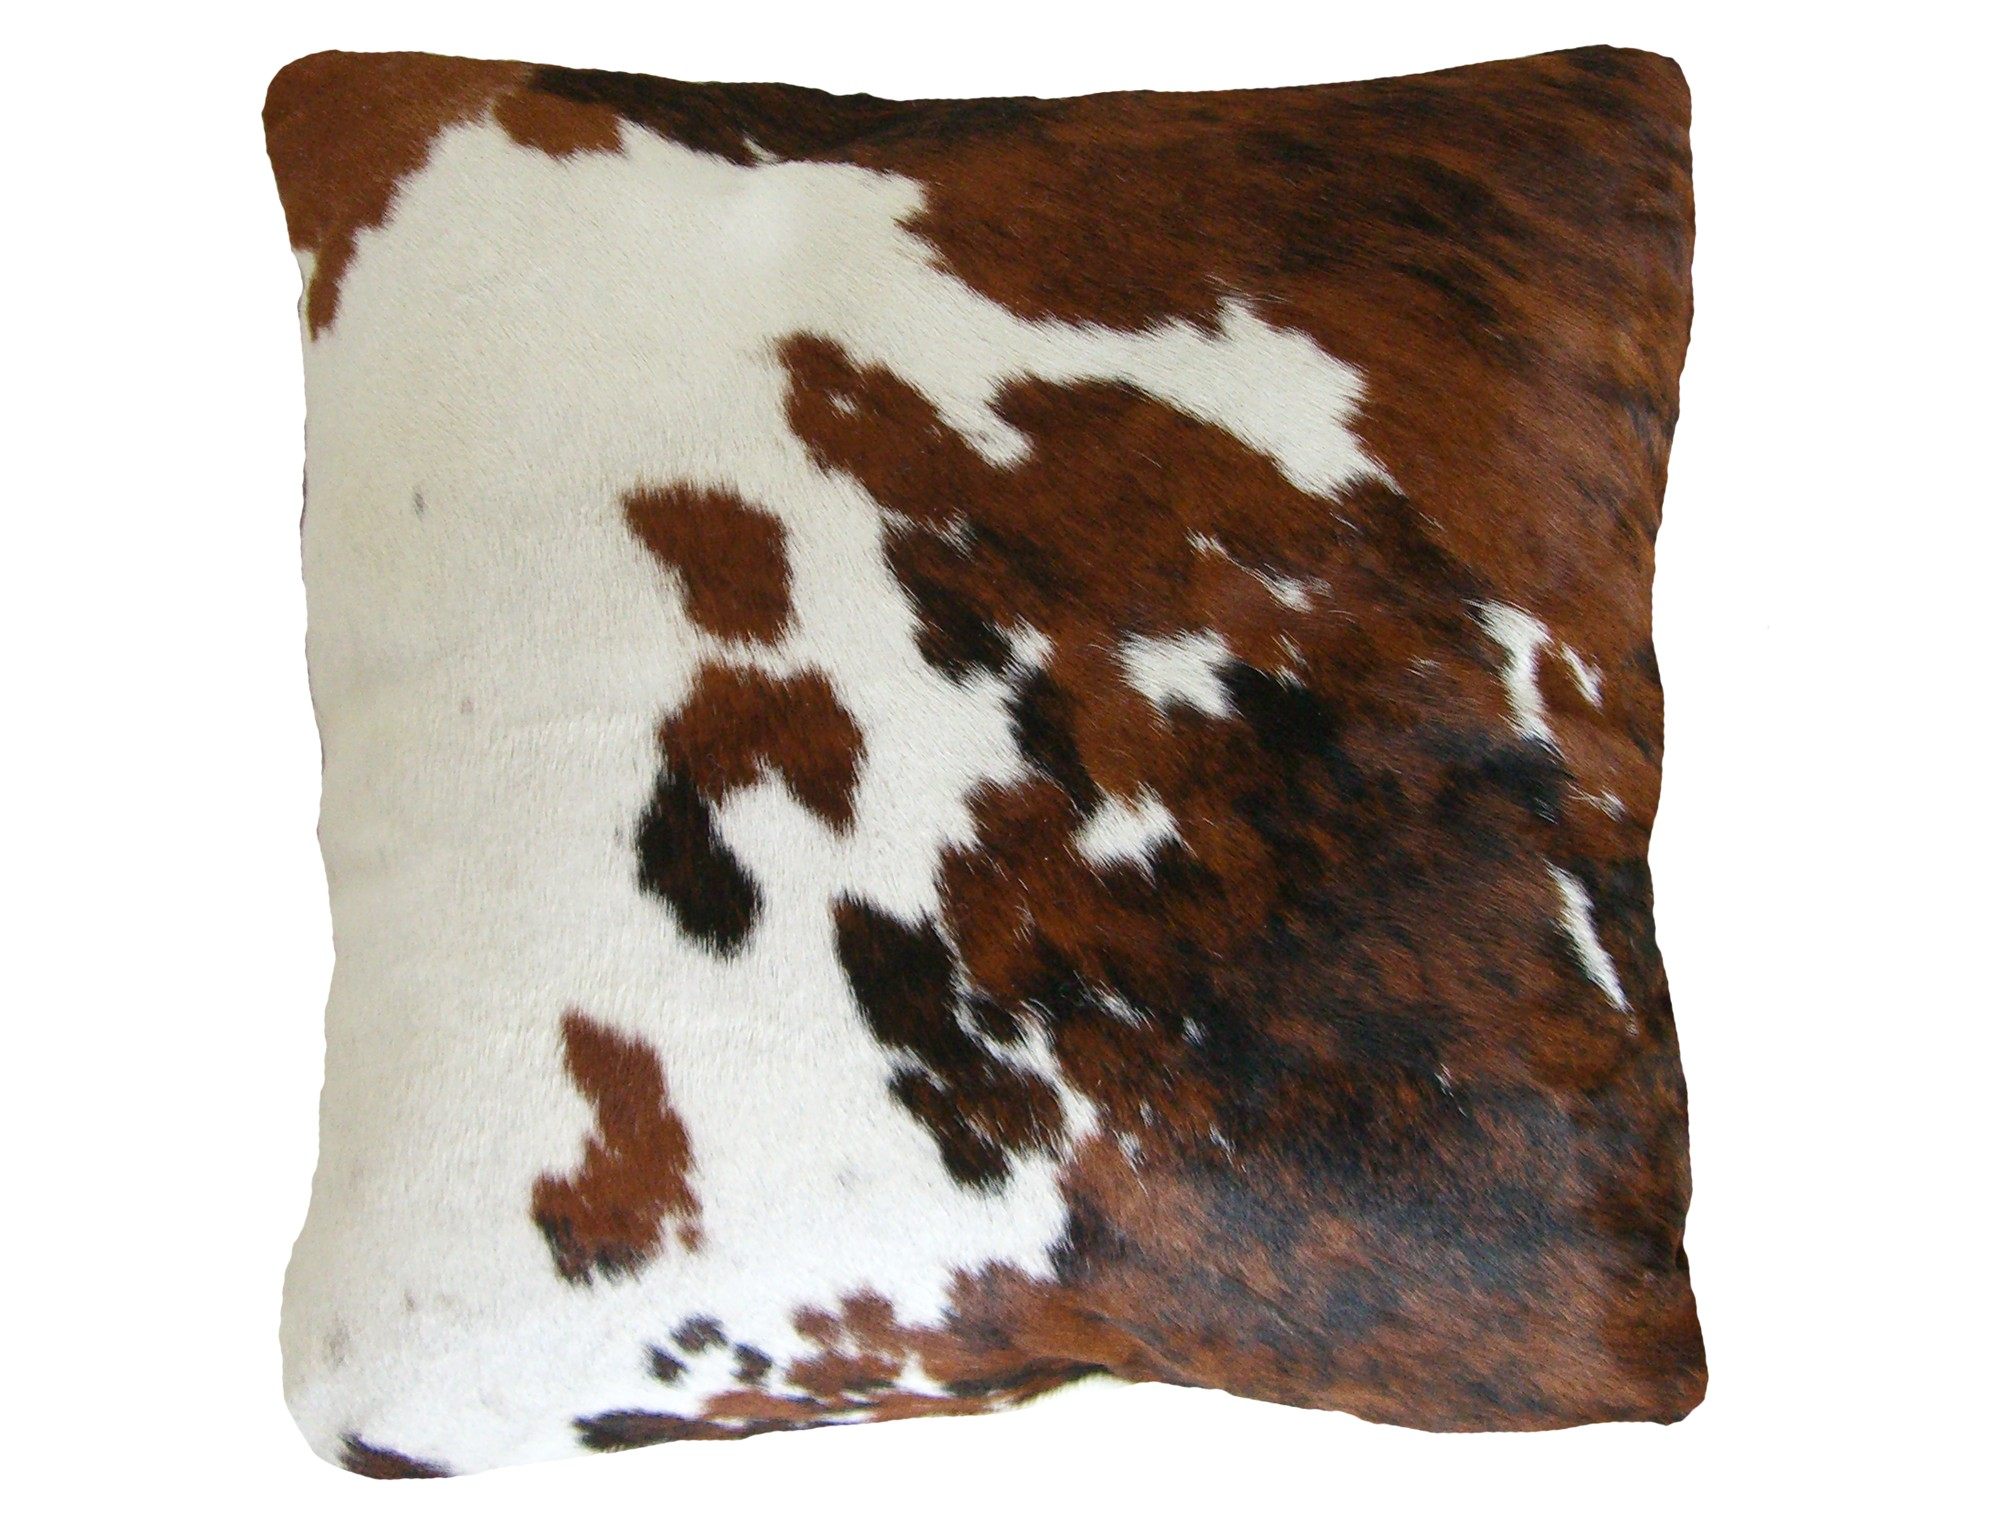 coussin en peau normande simple face. Black Bedroom Furniture Sets. Home Design Ideas